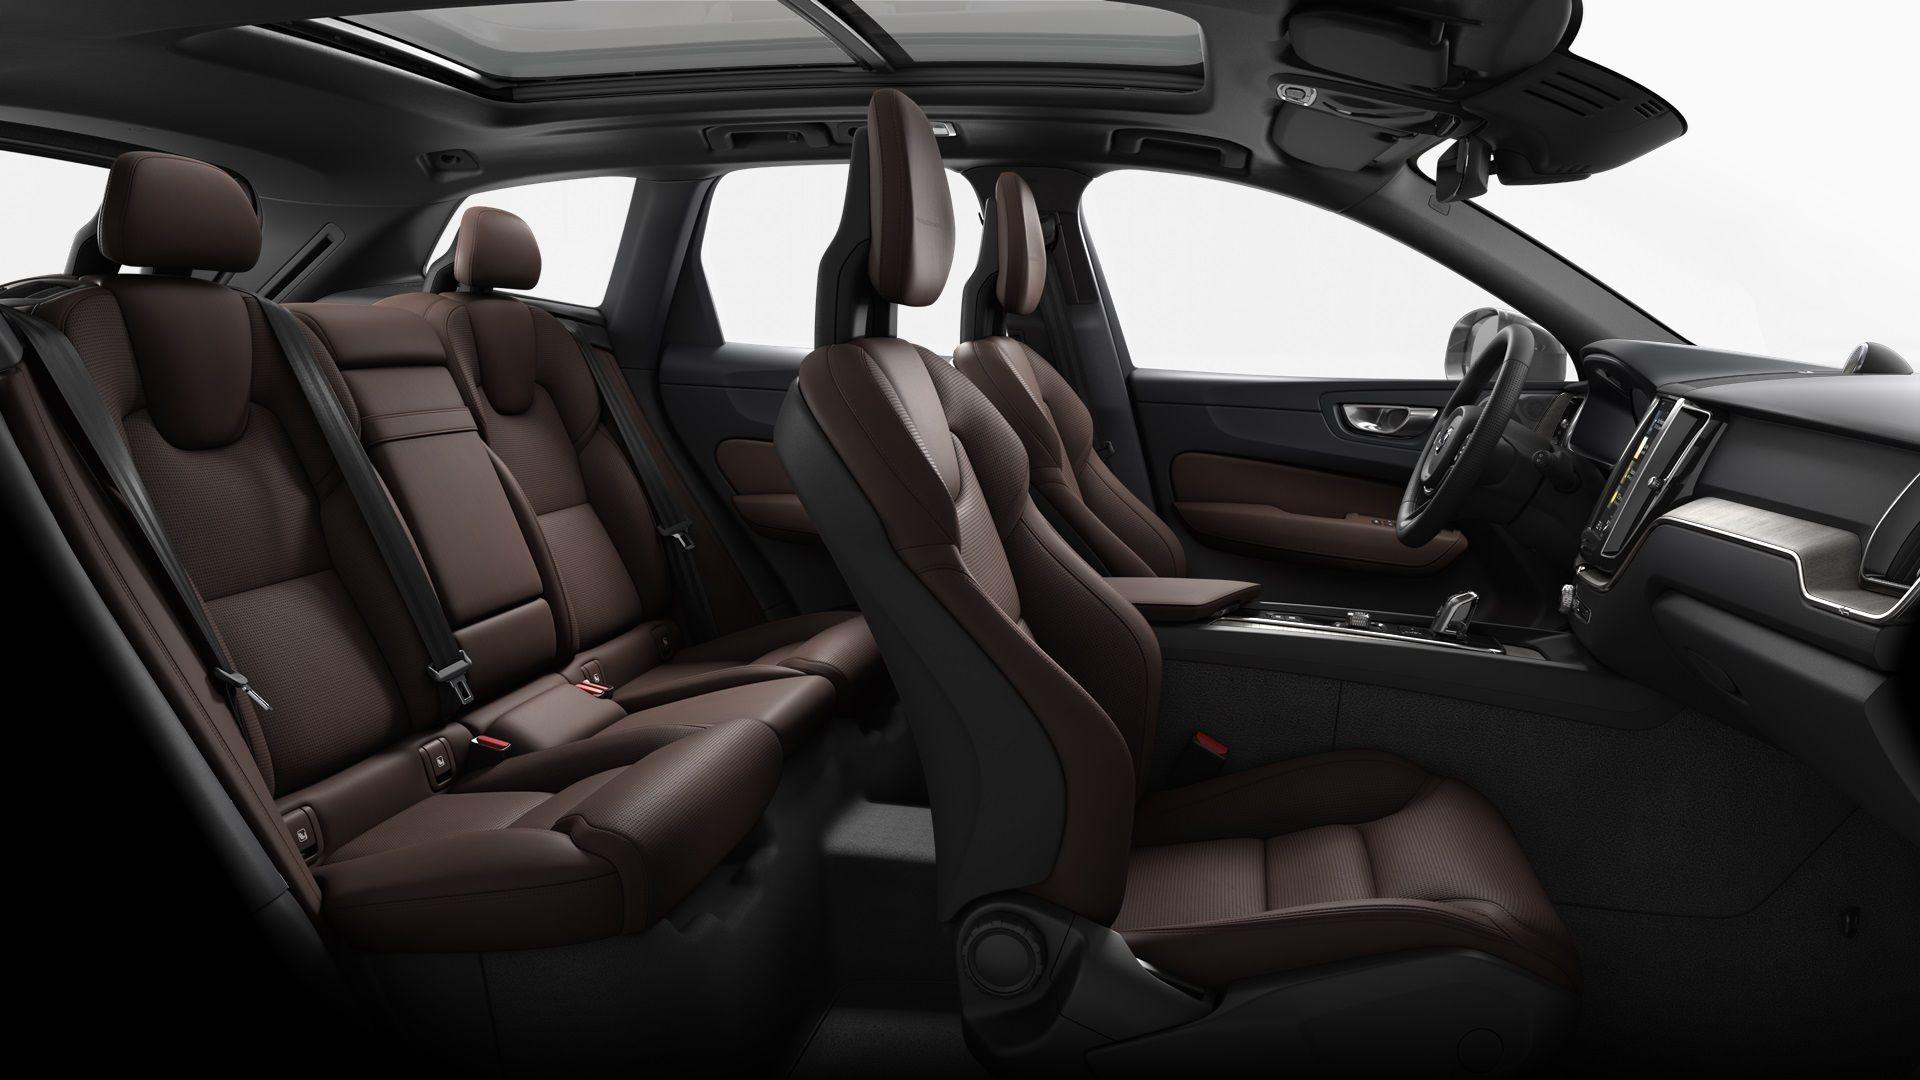 Volvo Xc60 Interior Side Volvo Xc90 Volvo Xc60 Volvo Xc90